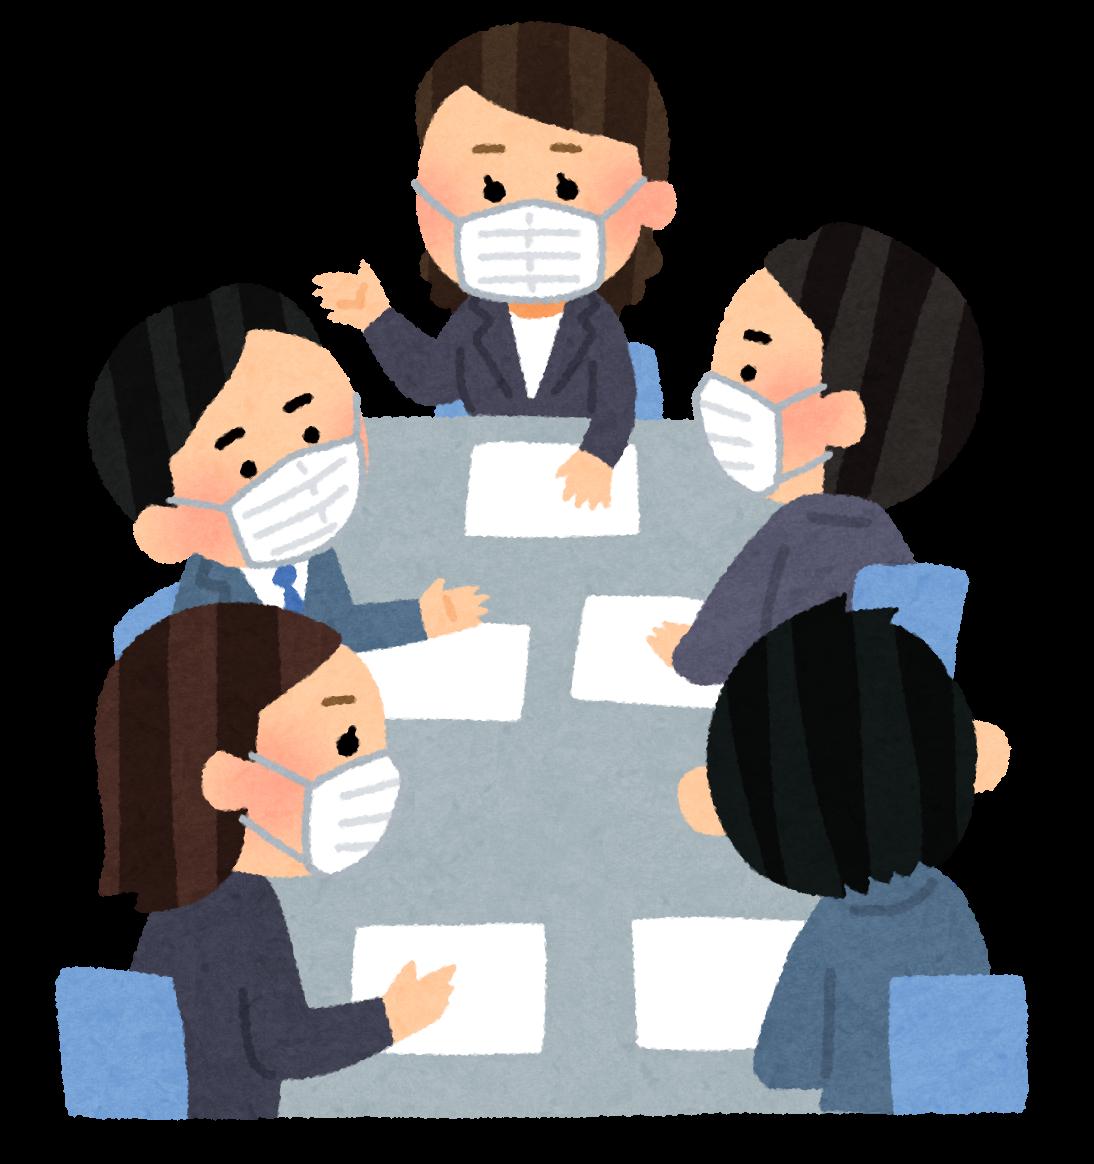 kaigi_mask_business.png (1094×1164)